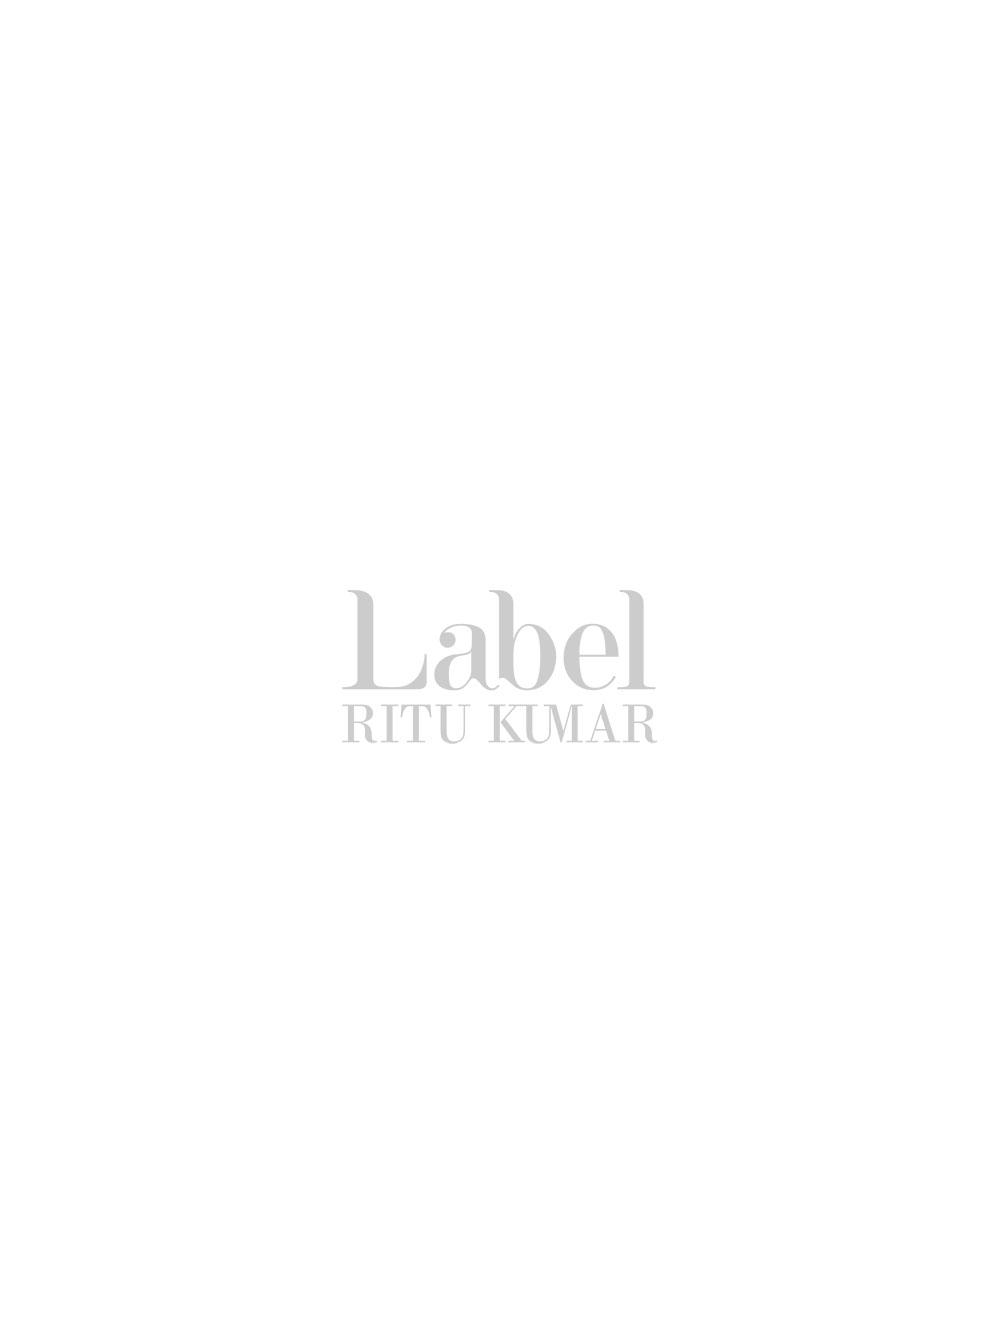 Aztec Woven Fuschia Jacket by label Ritu Kumar